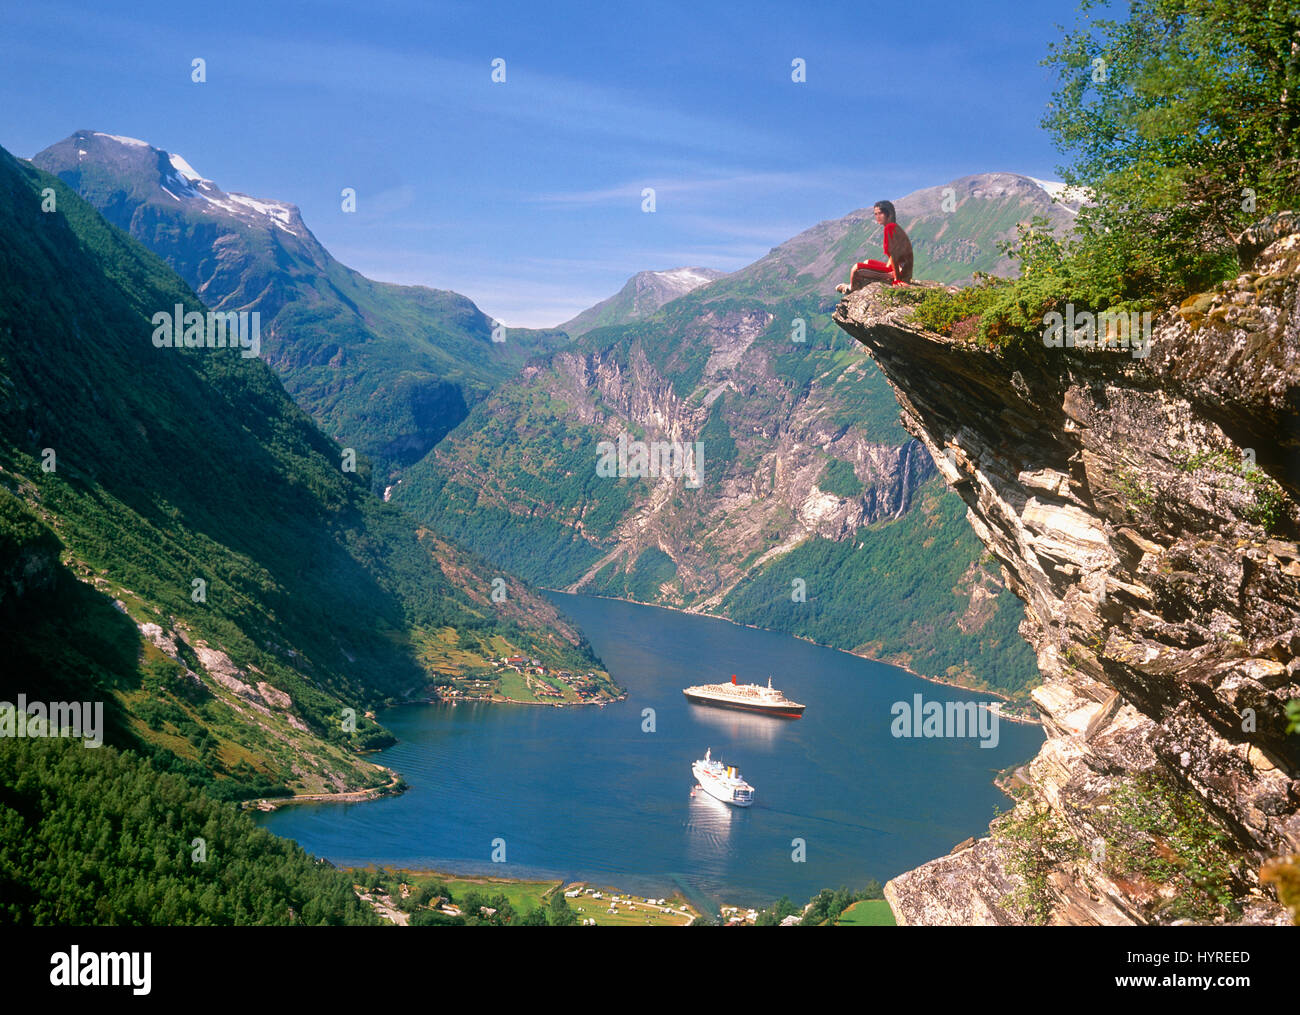 Cruise ships in Geirangerfjord, More og Romsdal, Norway - Stock Image